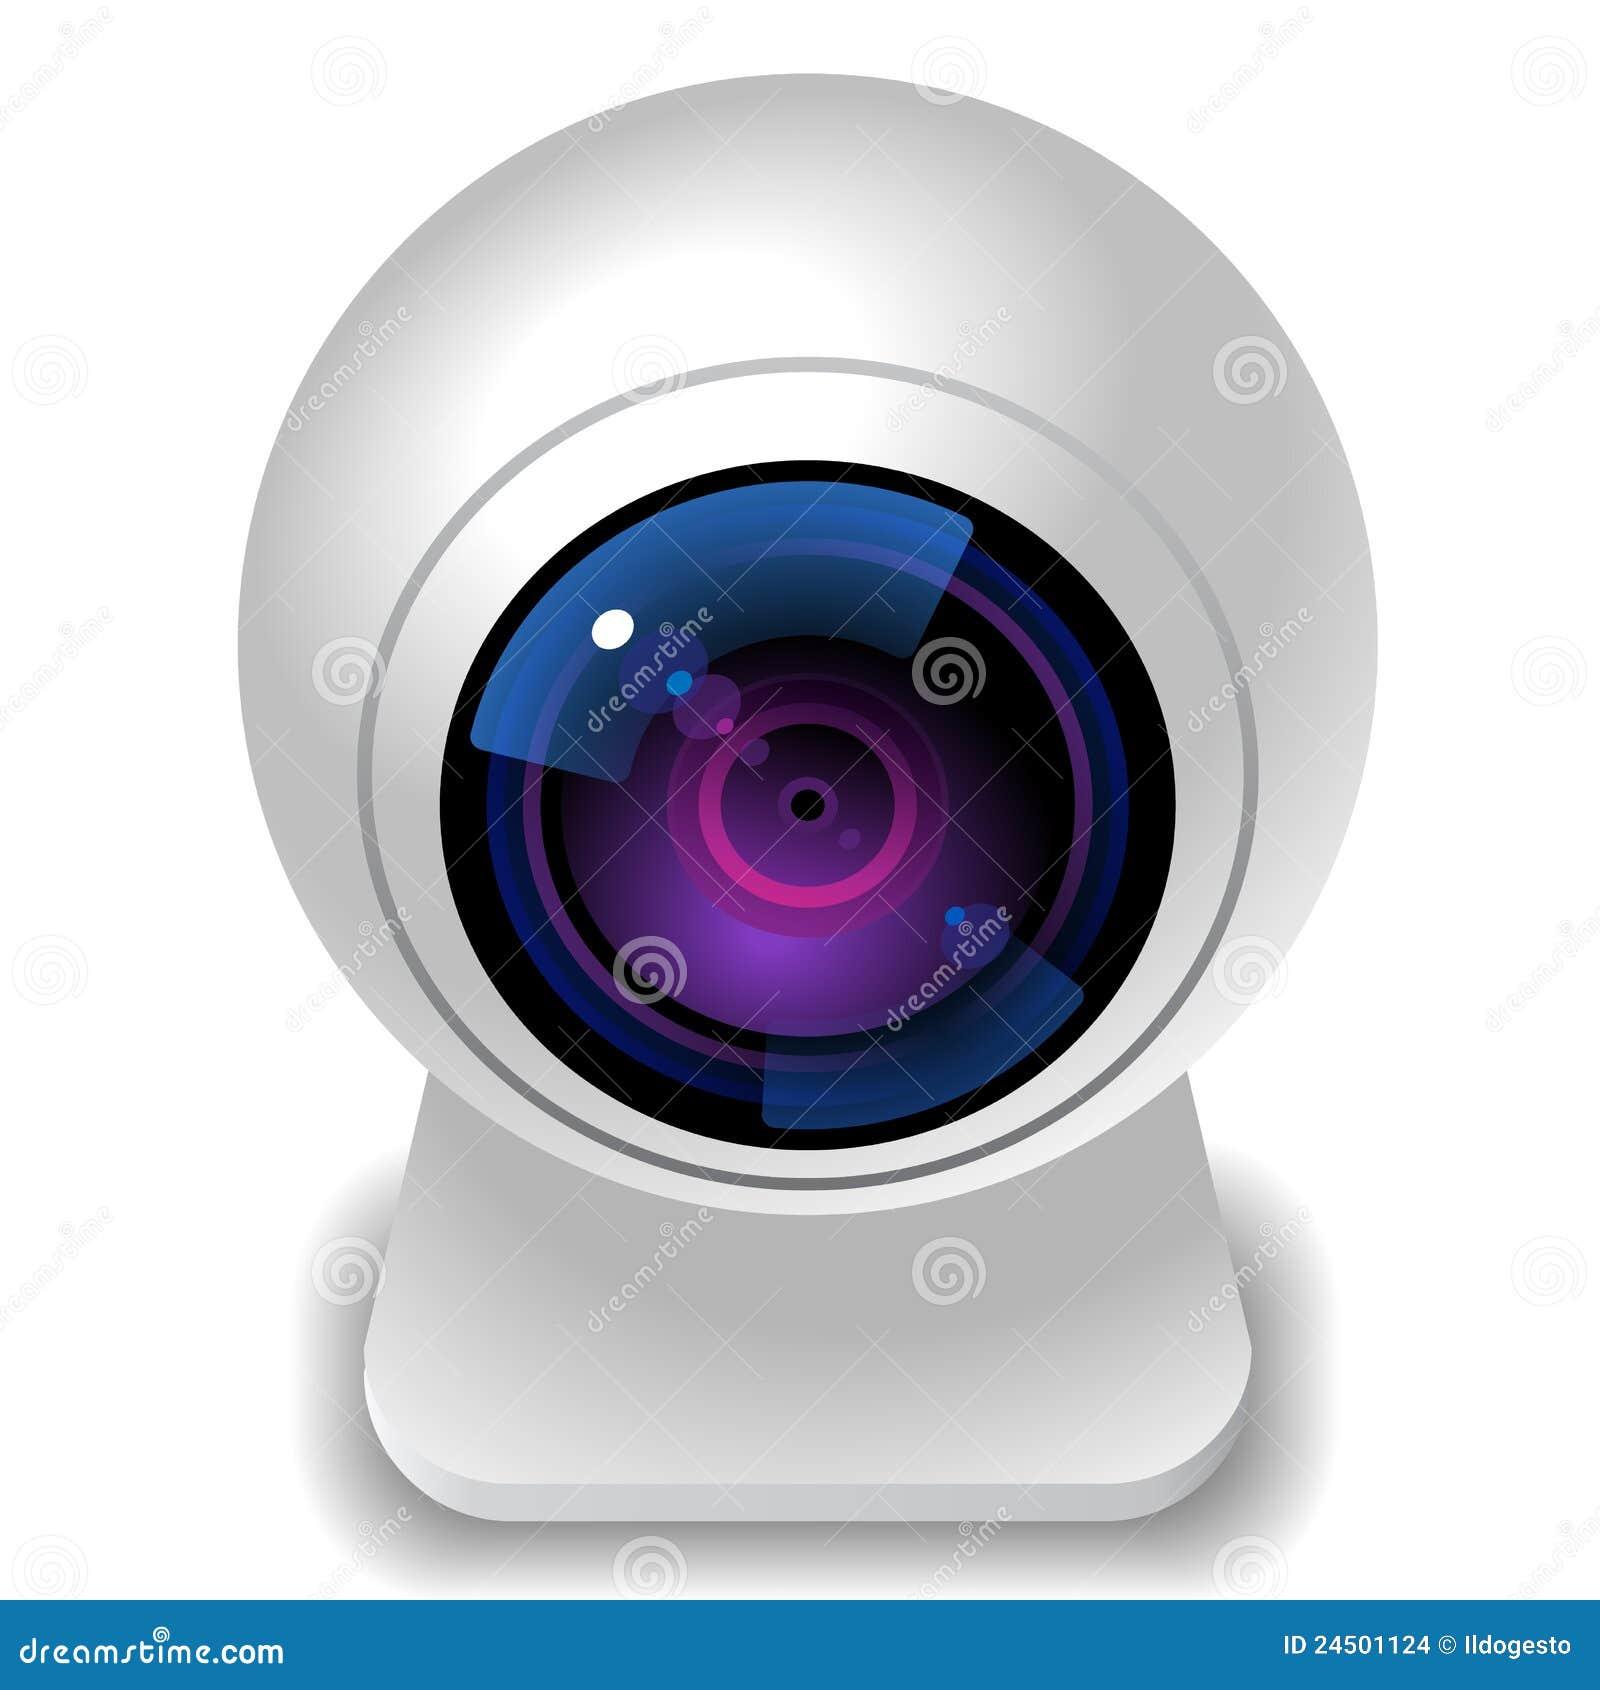 clipart web camera - photo #26